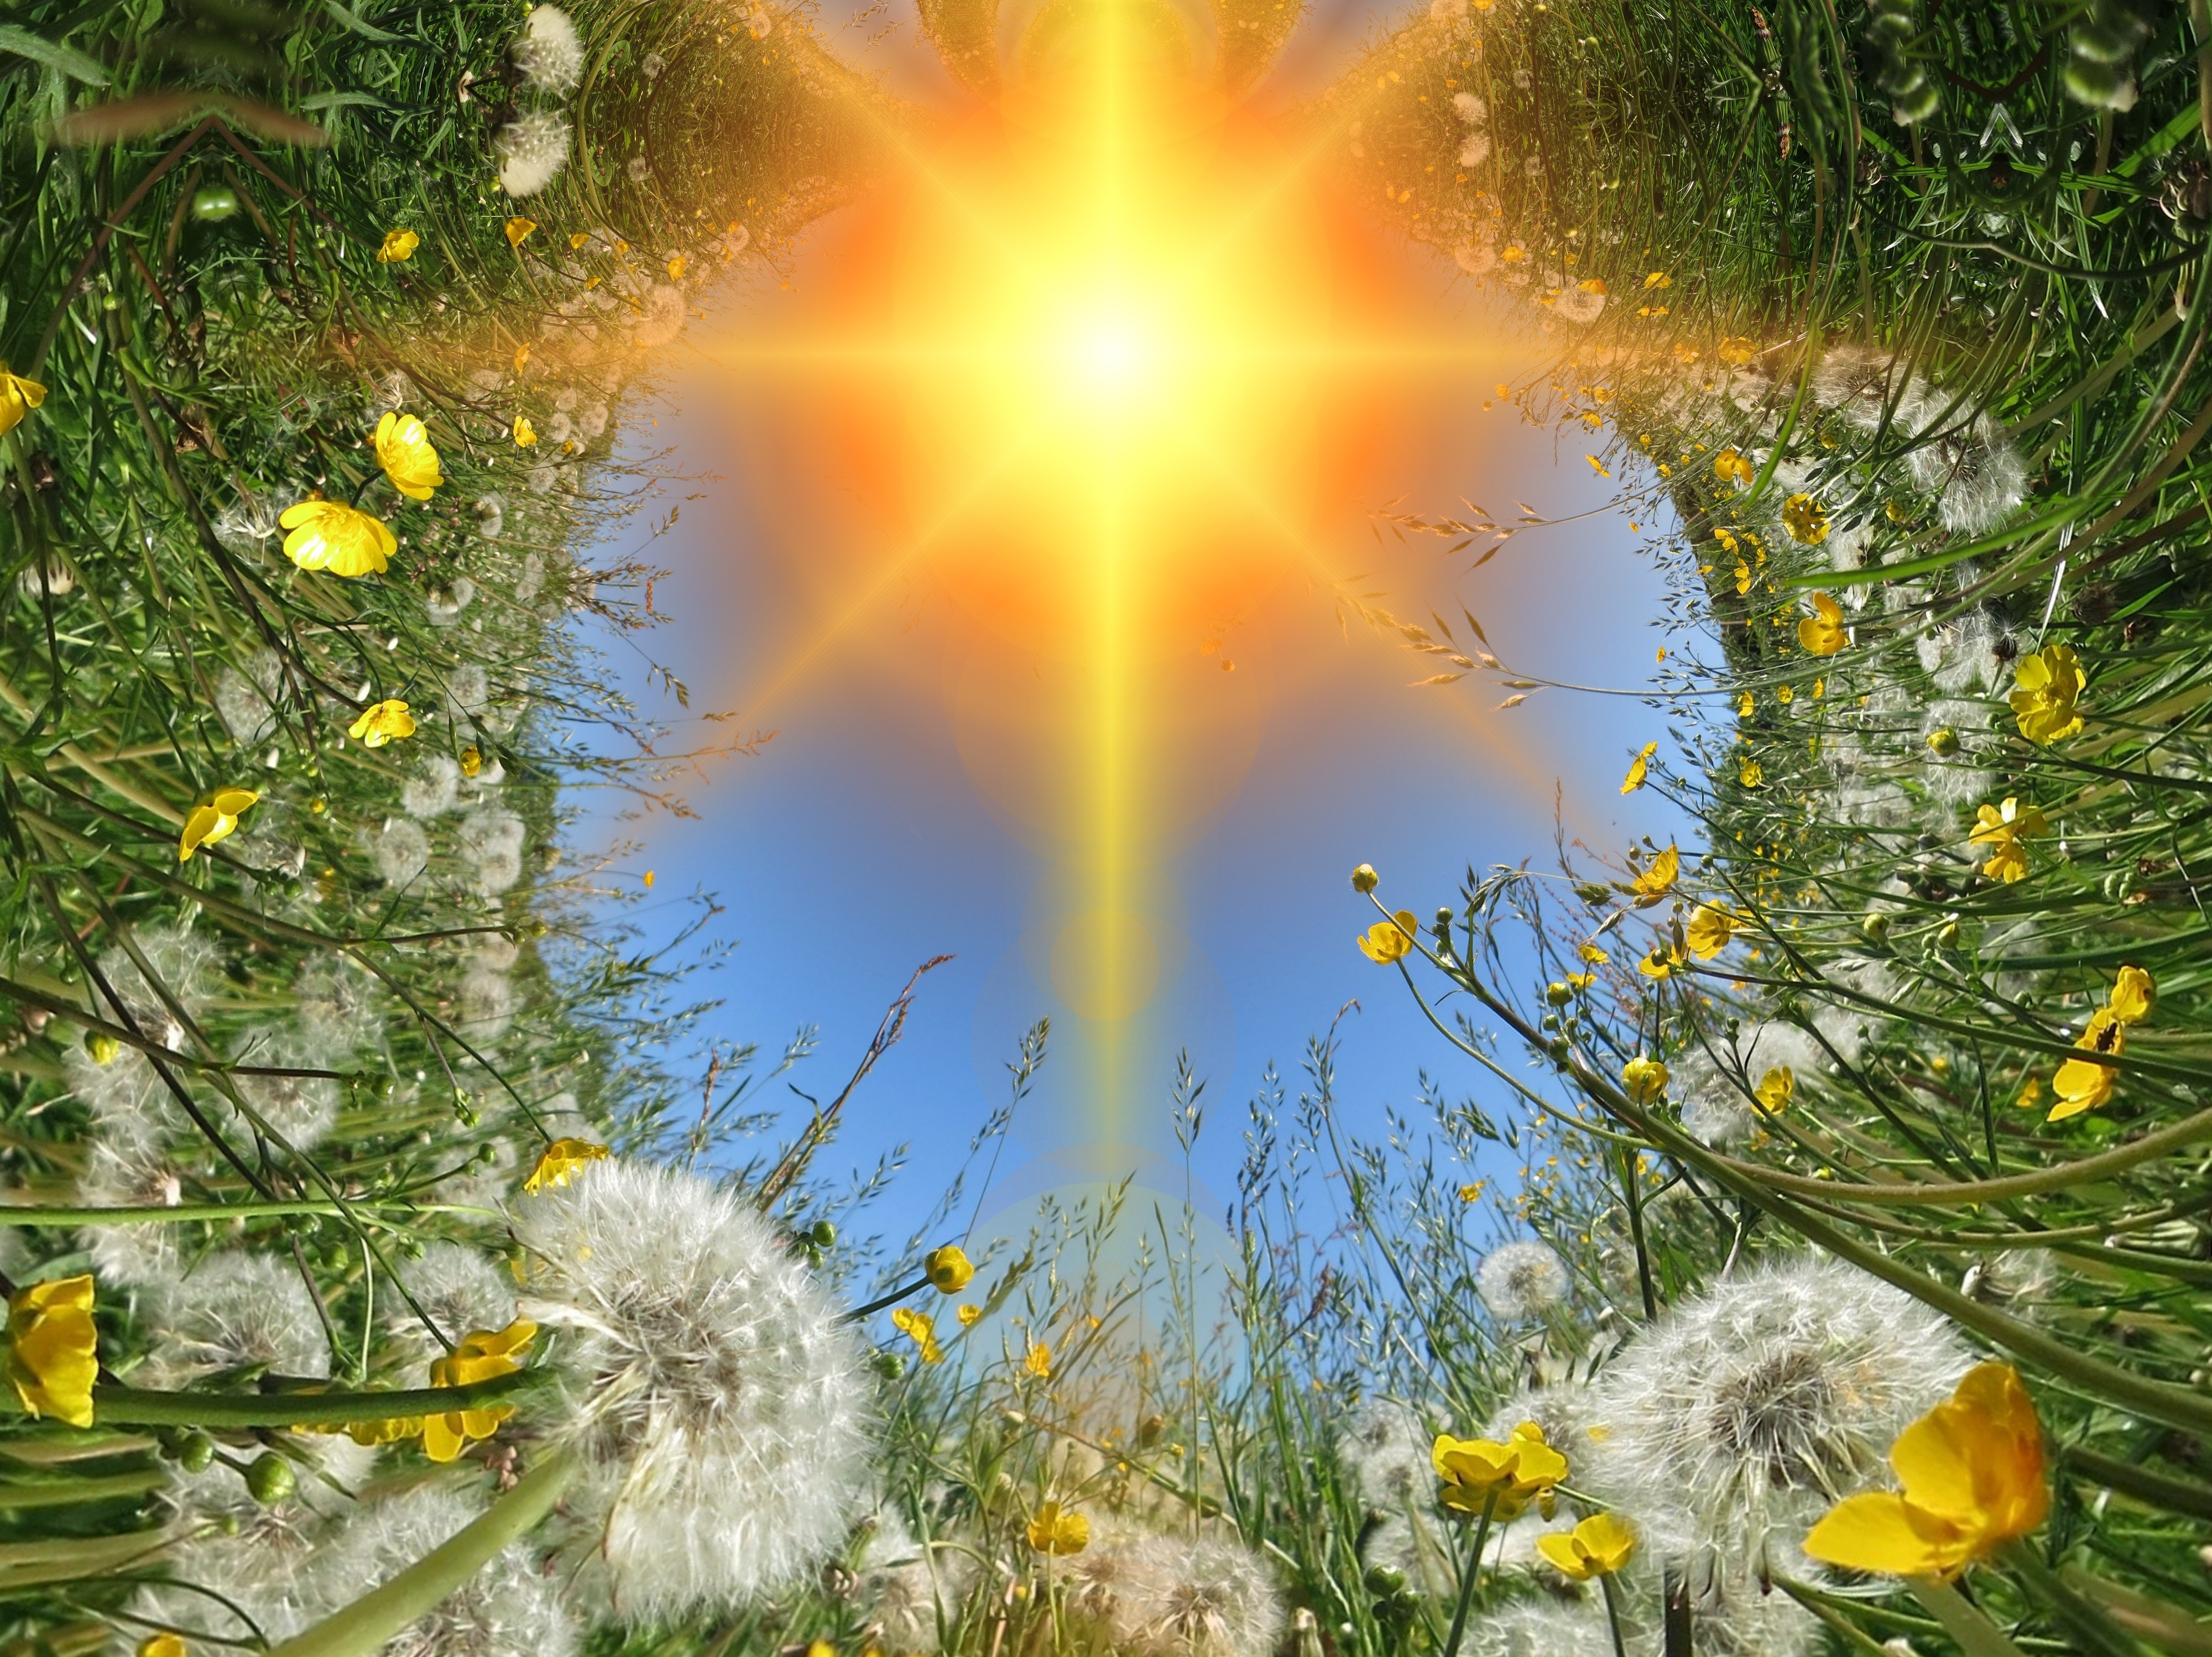 Lichtimpulse 7 - Veränderung - dandelions 419858